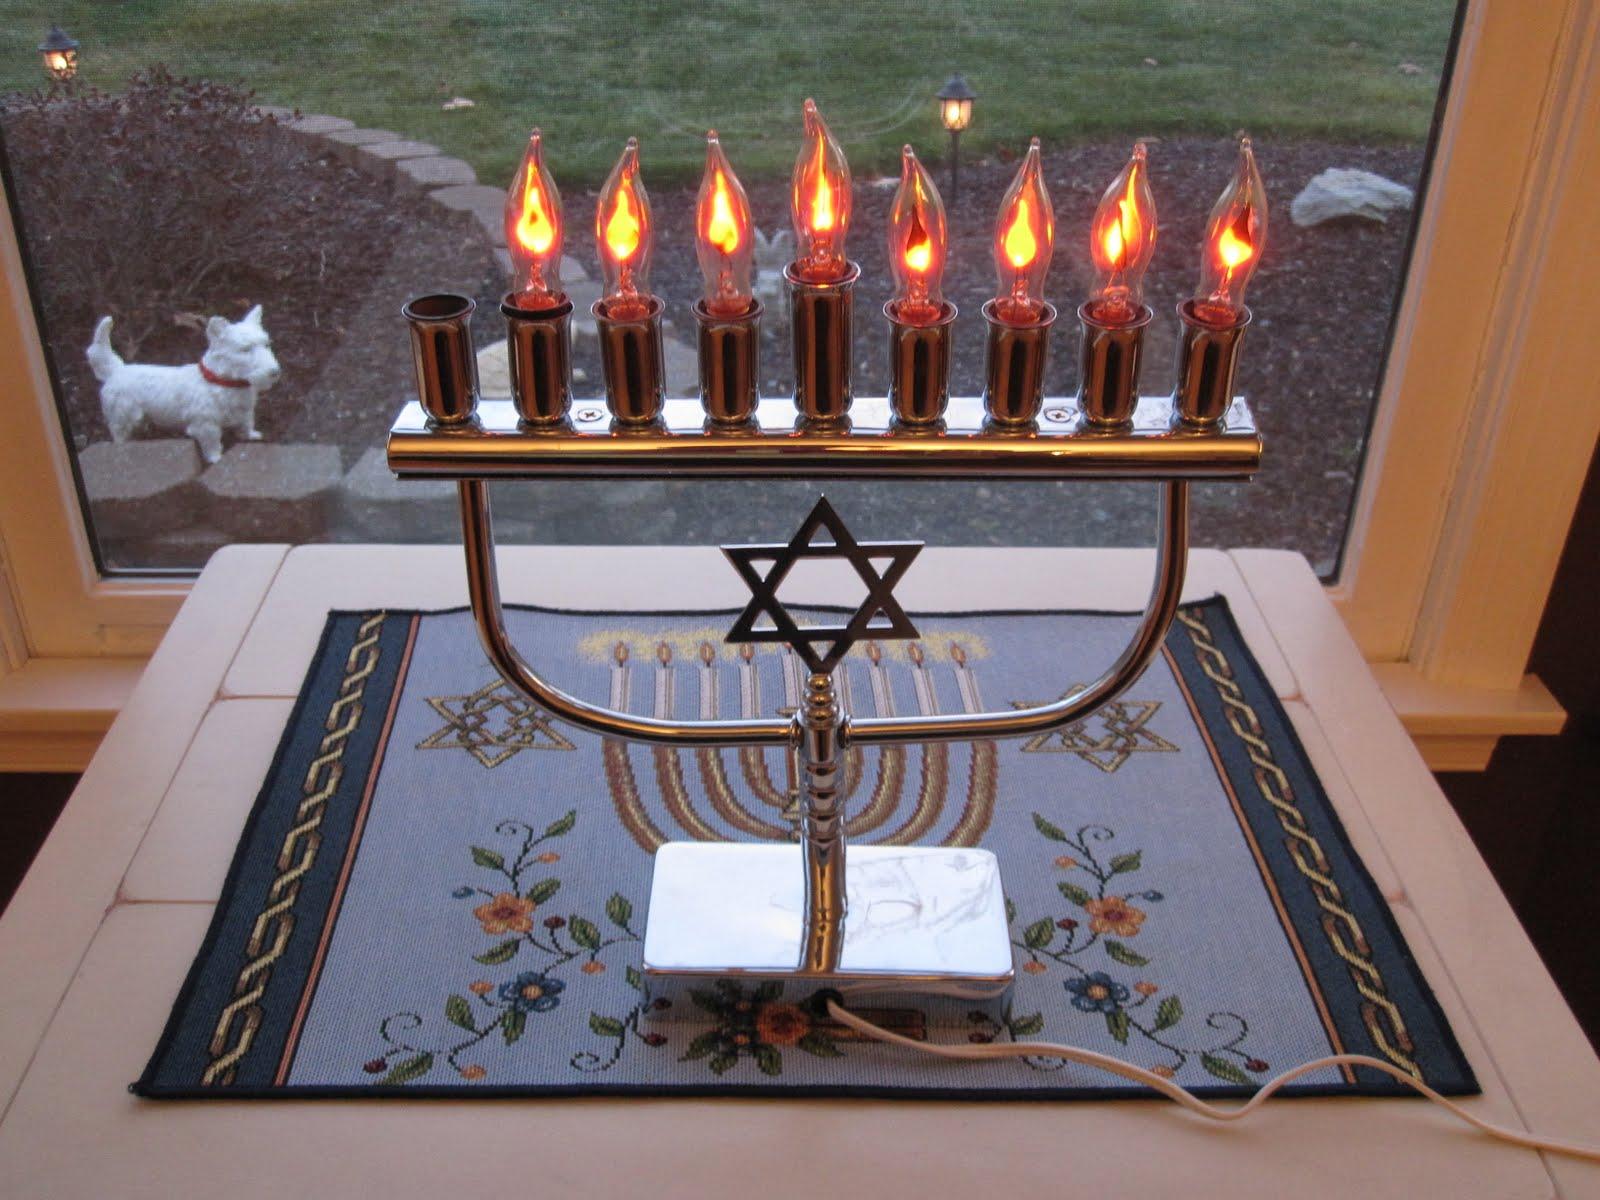 last night of hanukkah 2019 - HD1600×1200